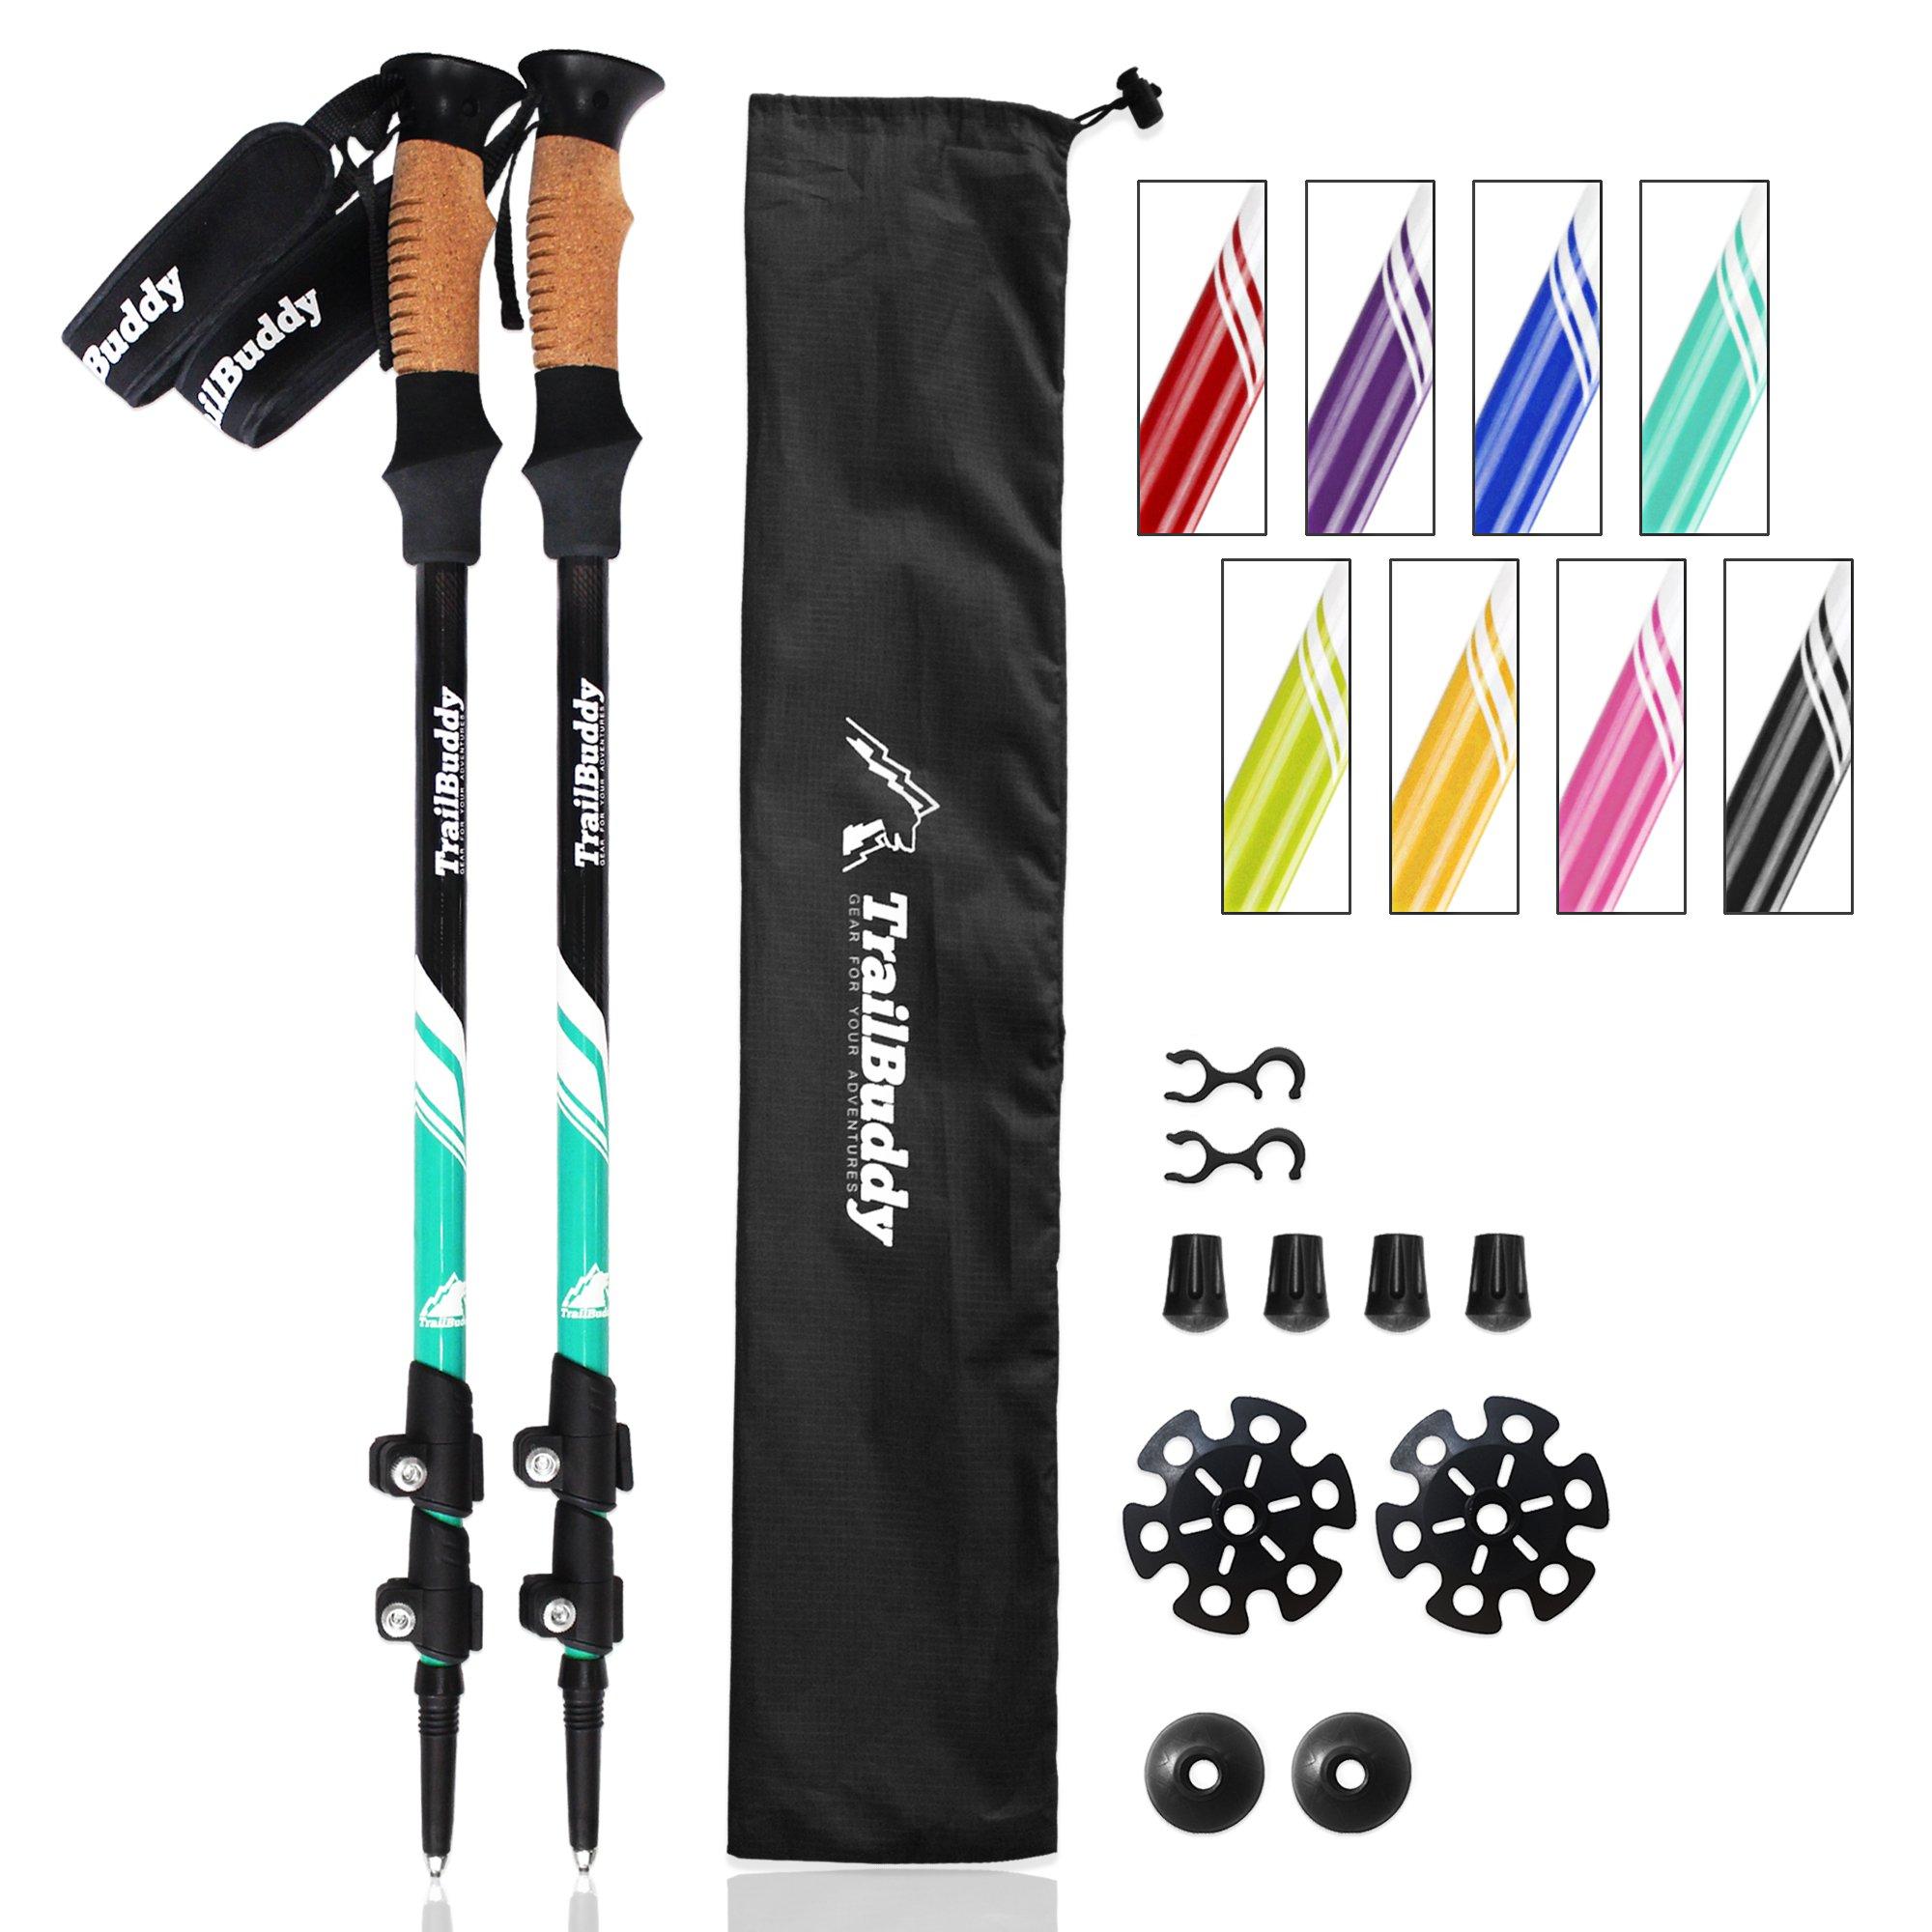 TrailBuddy Hiking Sticks - 2-pc Pack Adjustable Walking or Trekking Poles - Strong, Lightweight Aluminum 7075 - Quick Adjust Flip-Lock - Cork Grip, Padded Strap - (Aqua Sky)